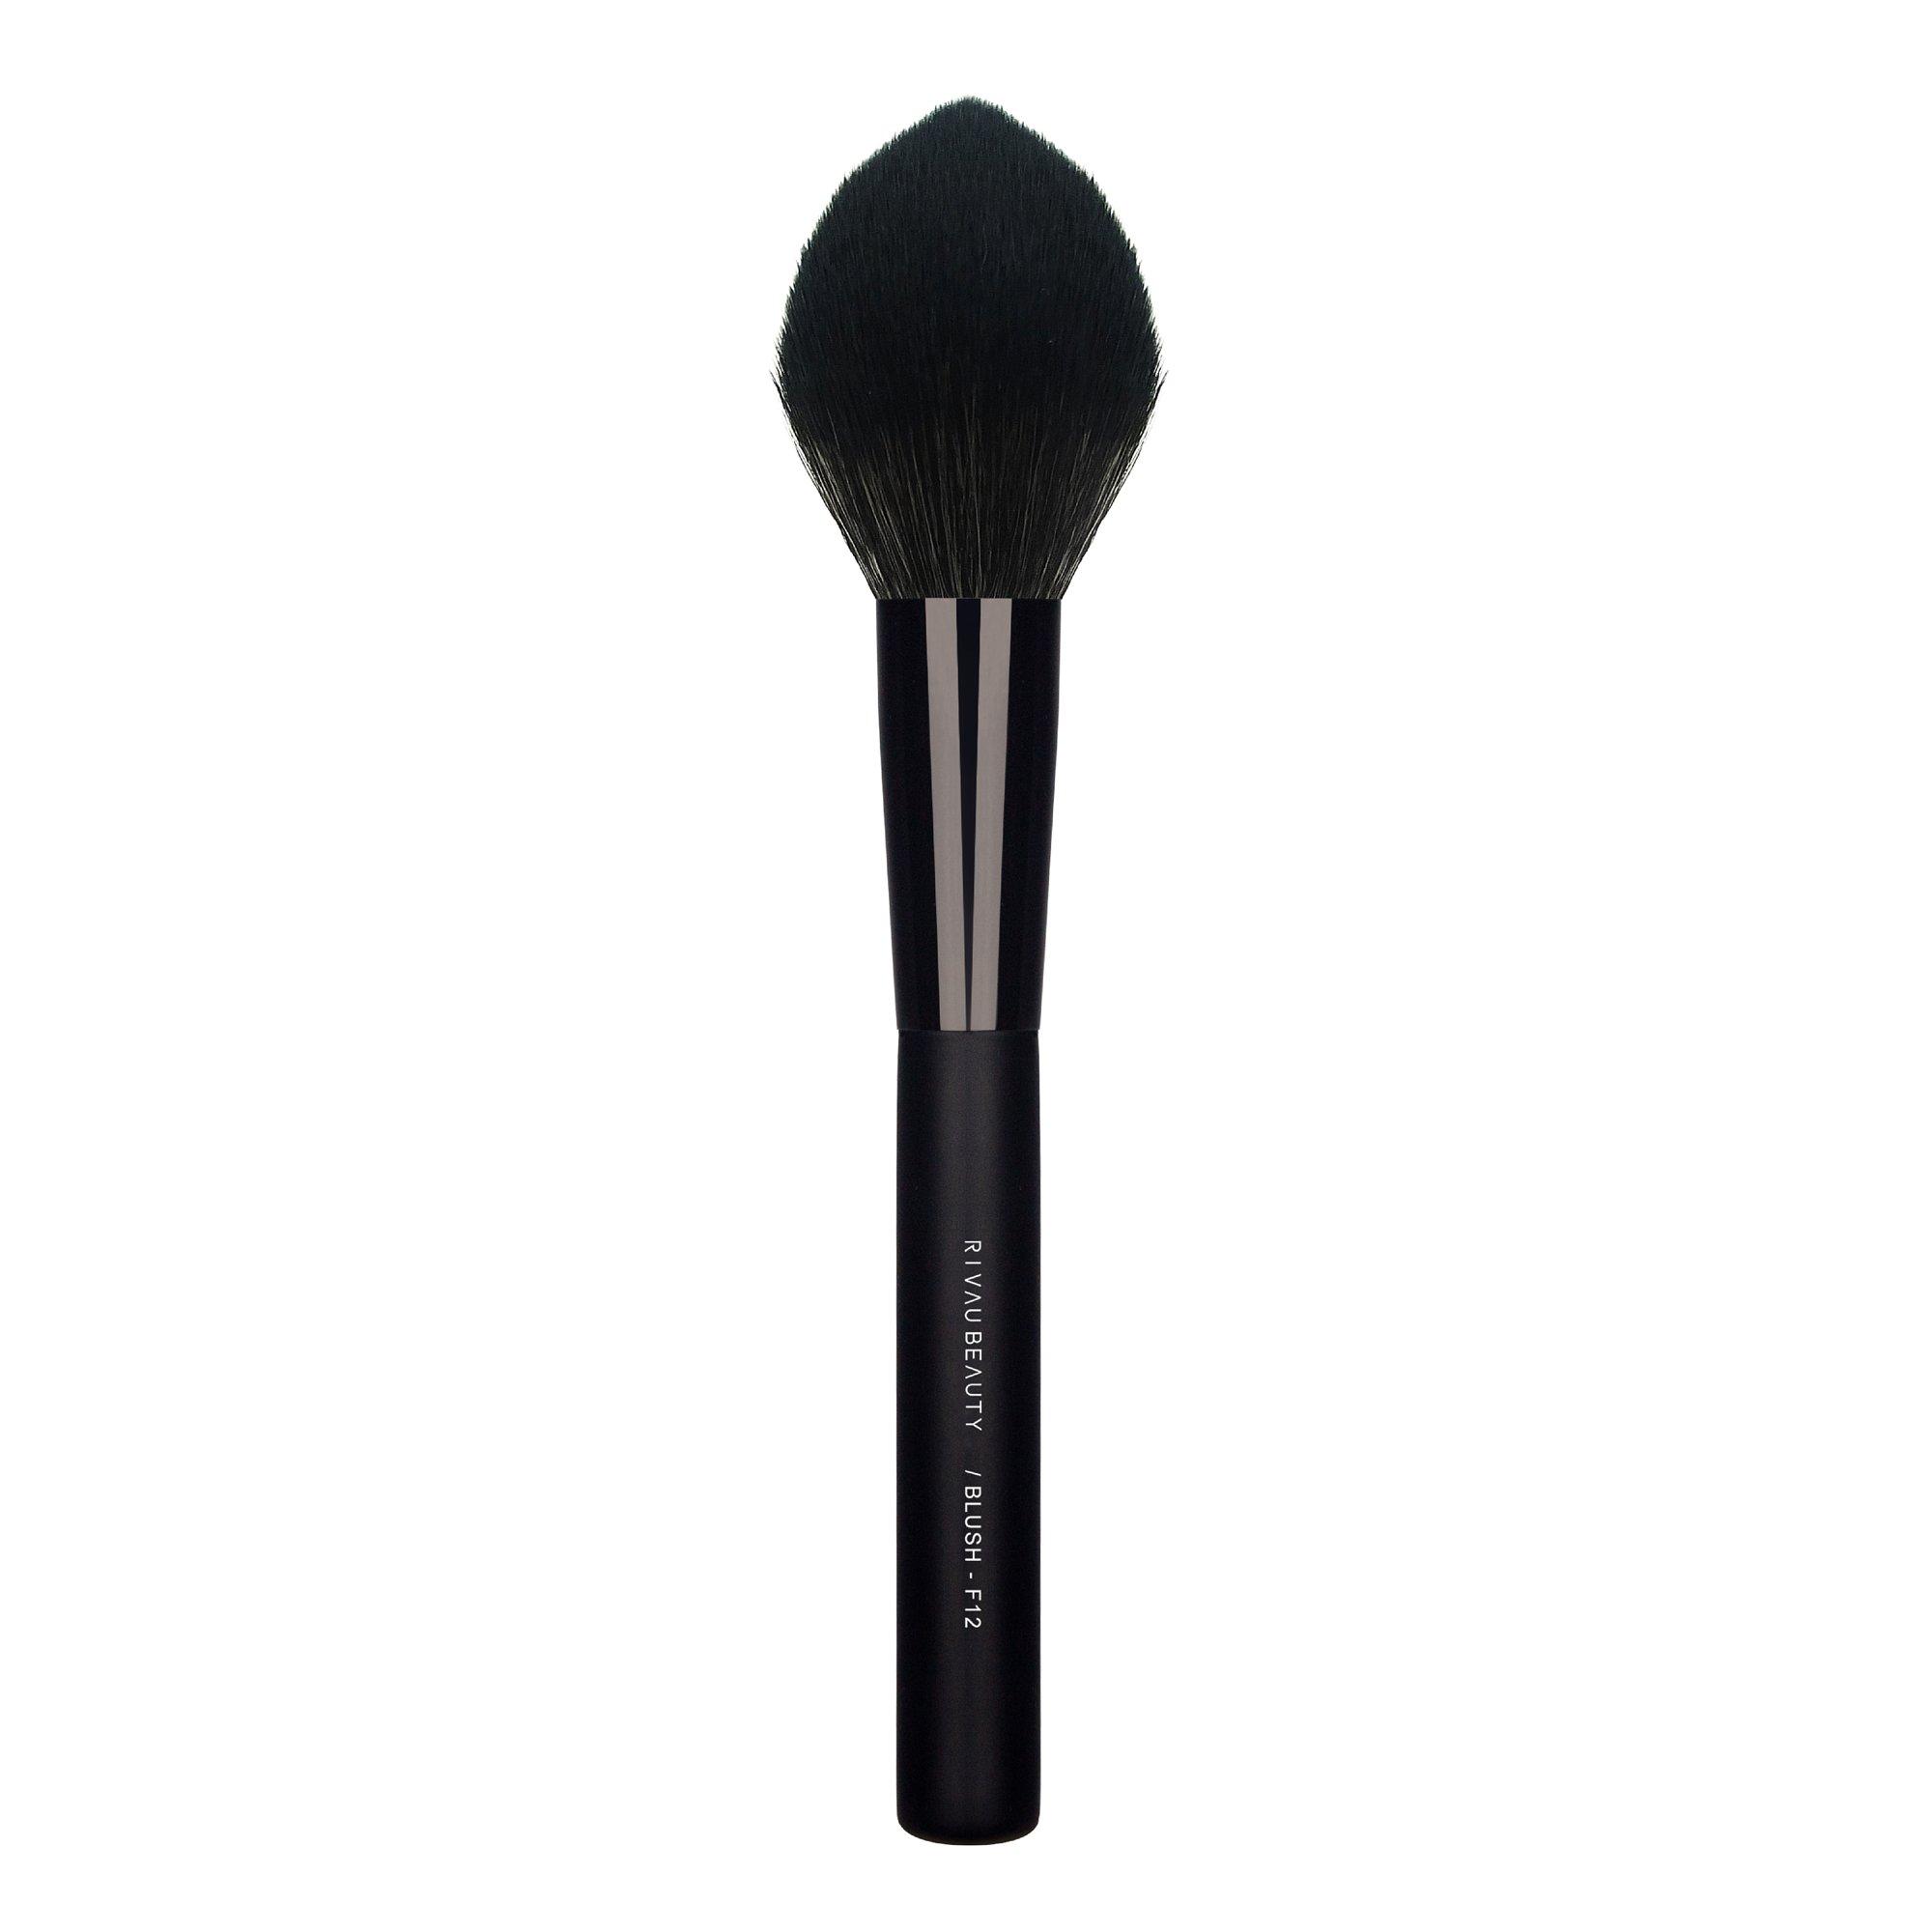 F12 腮紅刷 - 黑色系列 / 可當蜜粉刷 化妝刷 刷具 美妝 工具 IG 網紅 推薦 禮物